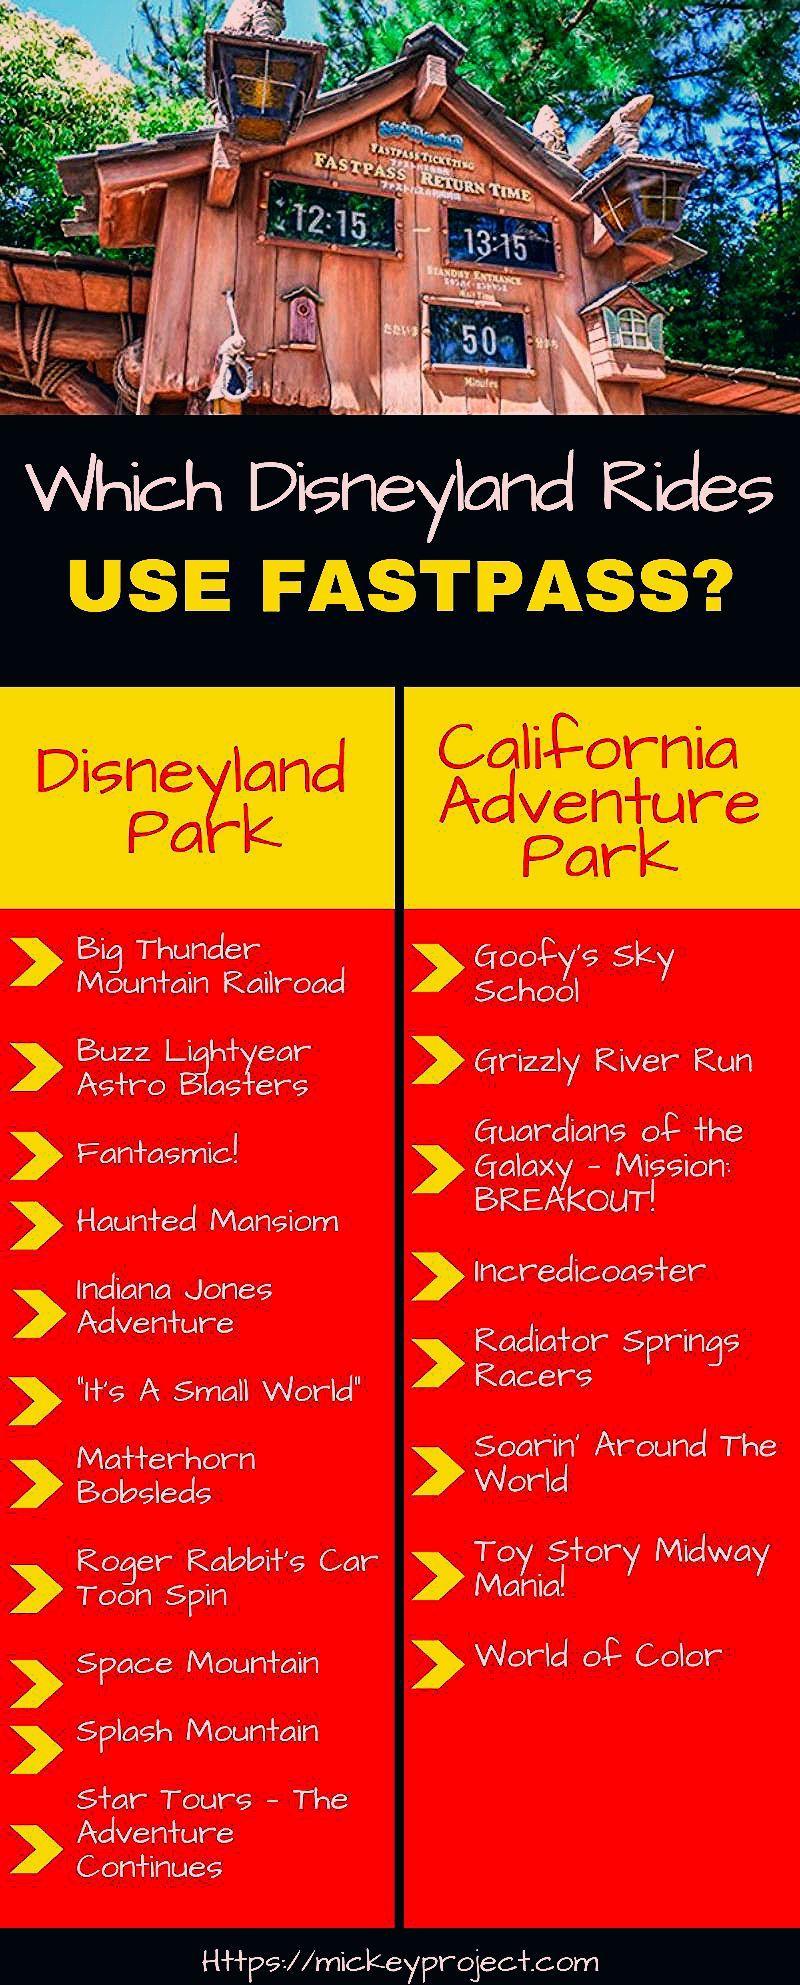 Photo of Disneyland Fastpass Ride List